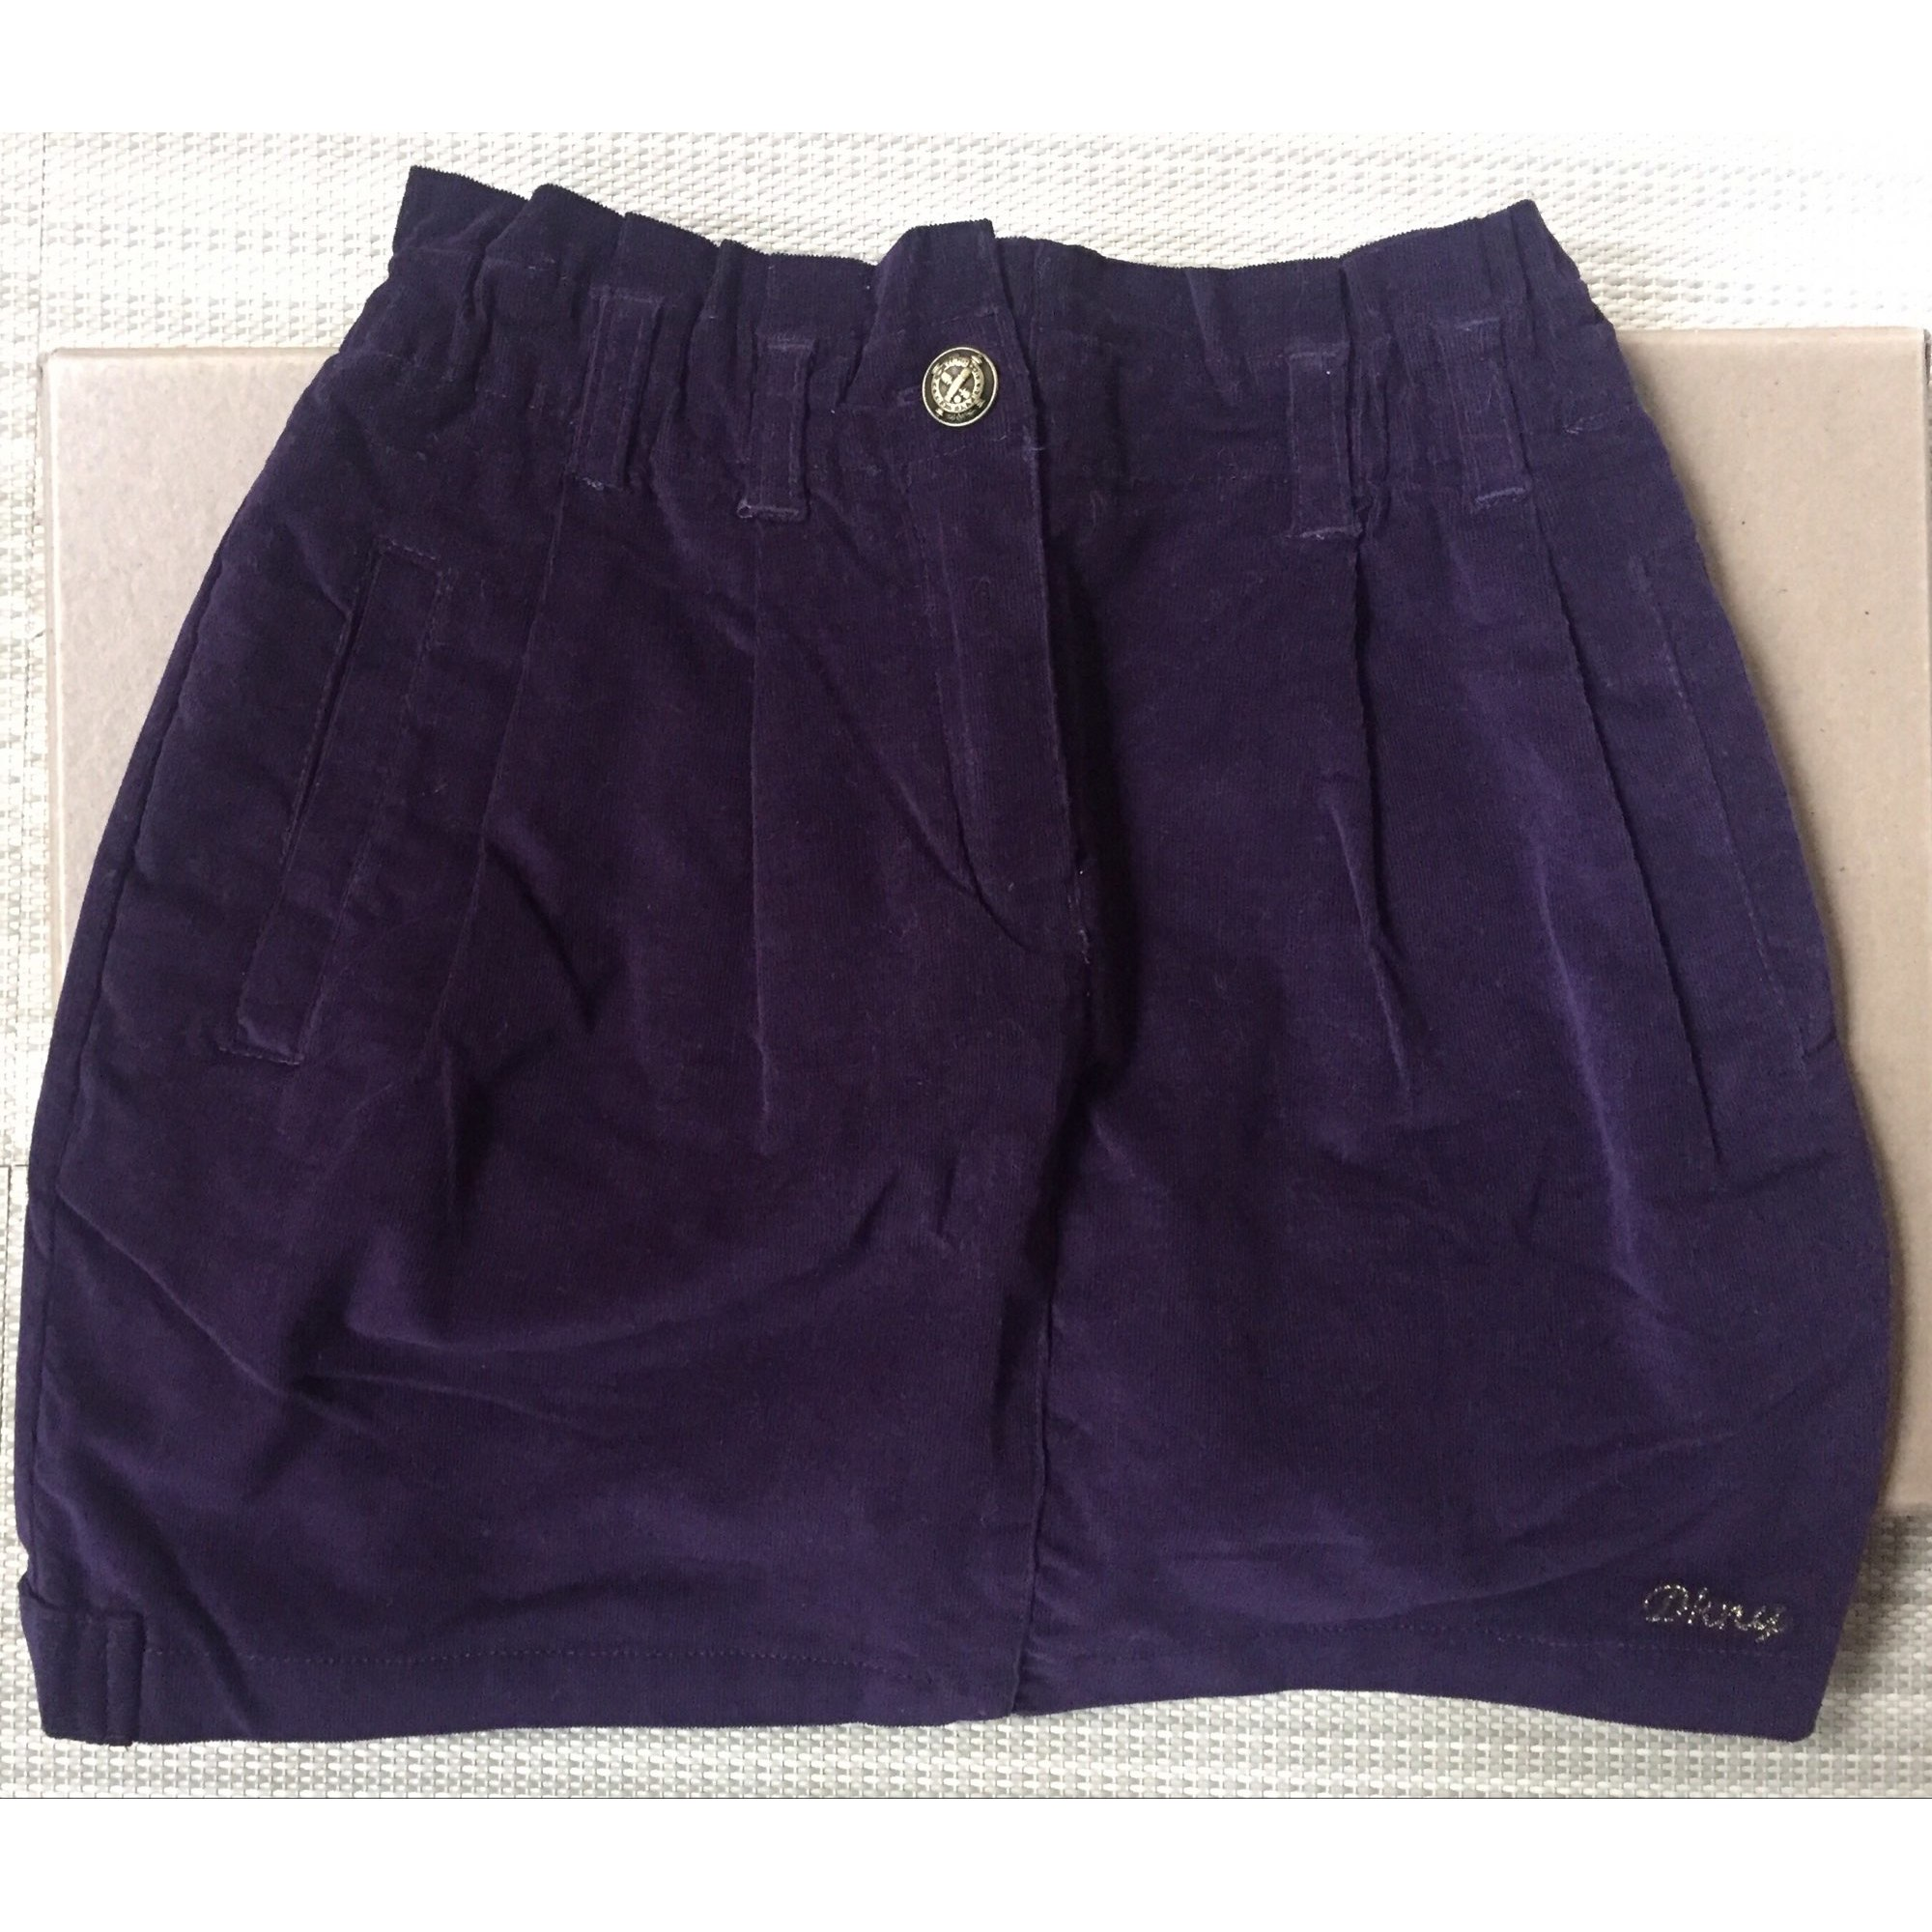 Jupe DKNY Violet, mauve, lavande